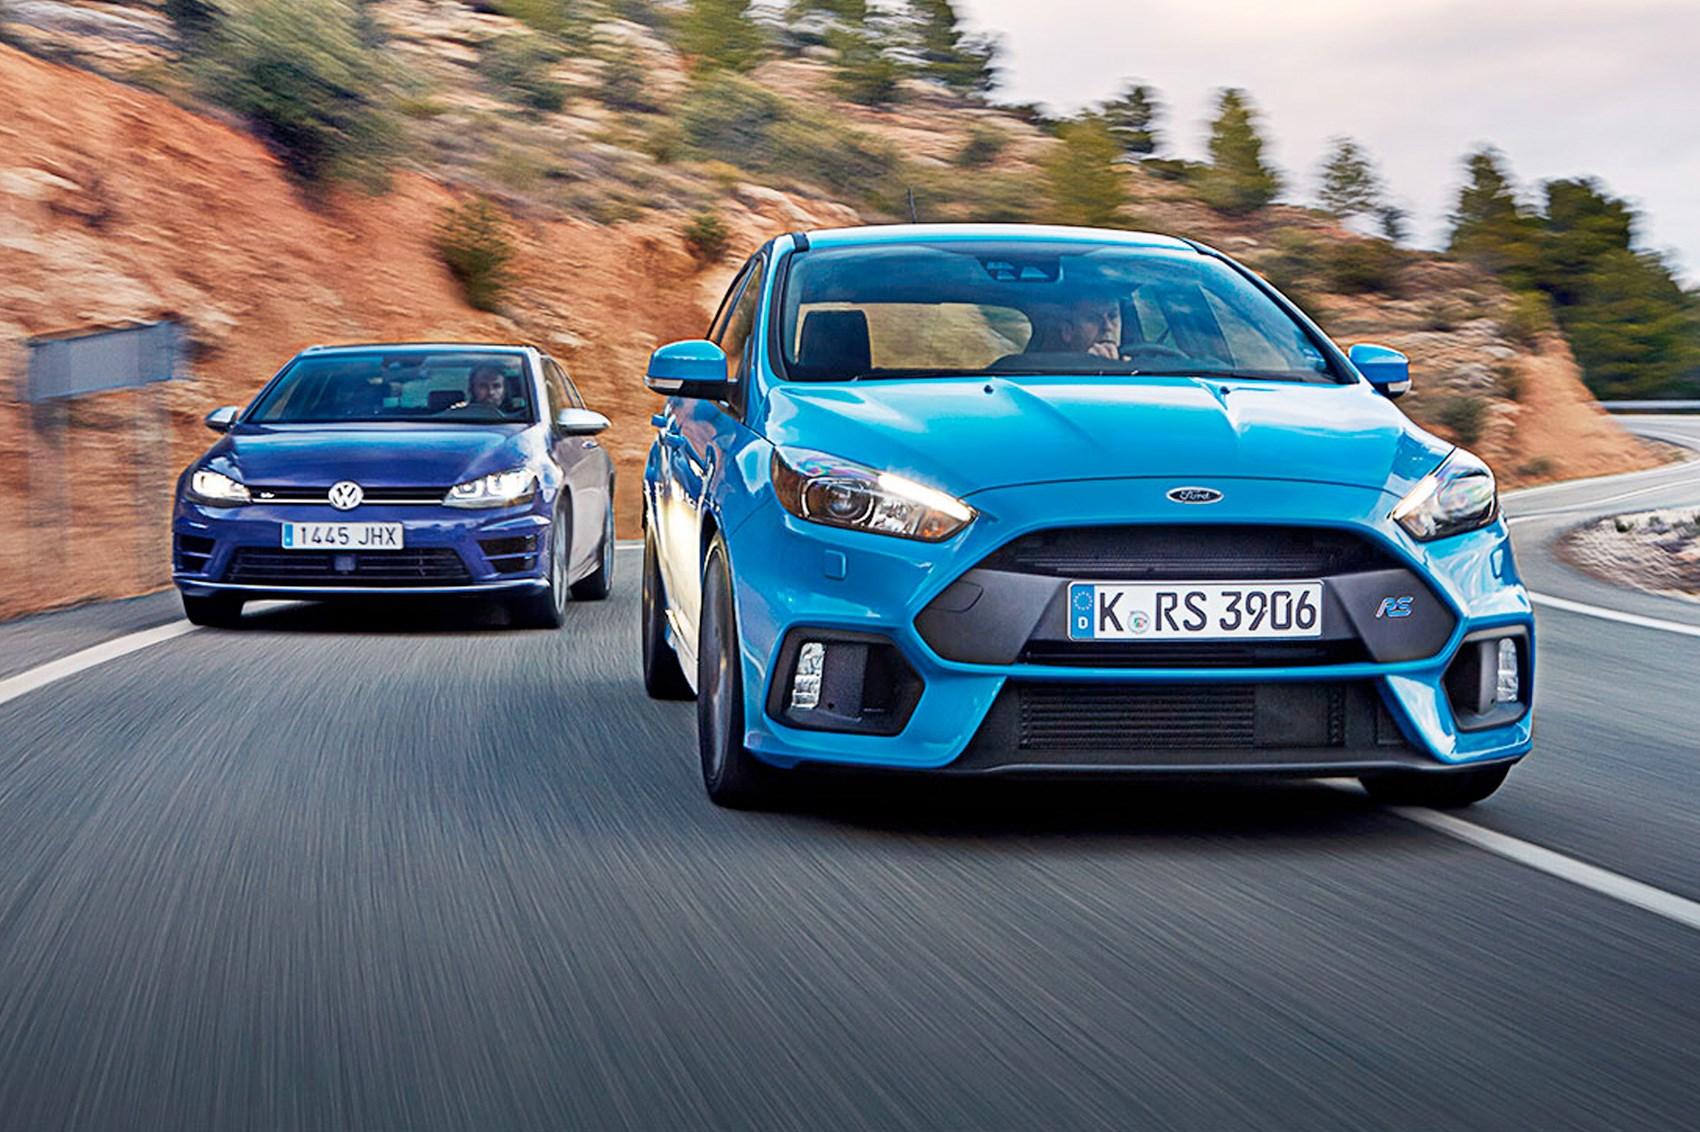 Ford ve Volkswagen Türkiye